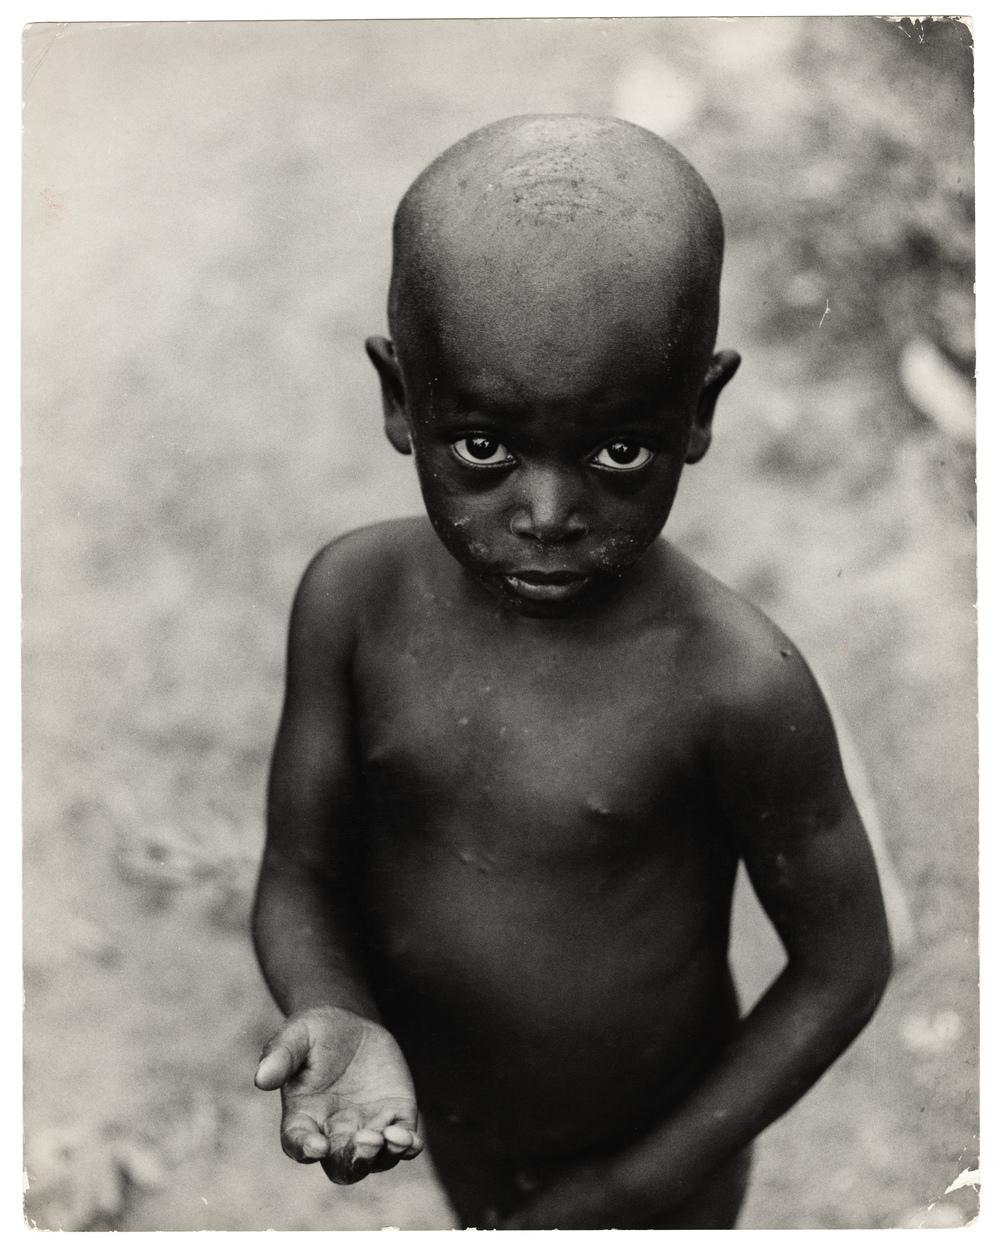 Carlo Bavagnoli, Biafra, c.1968